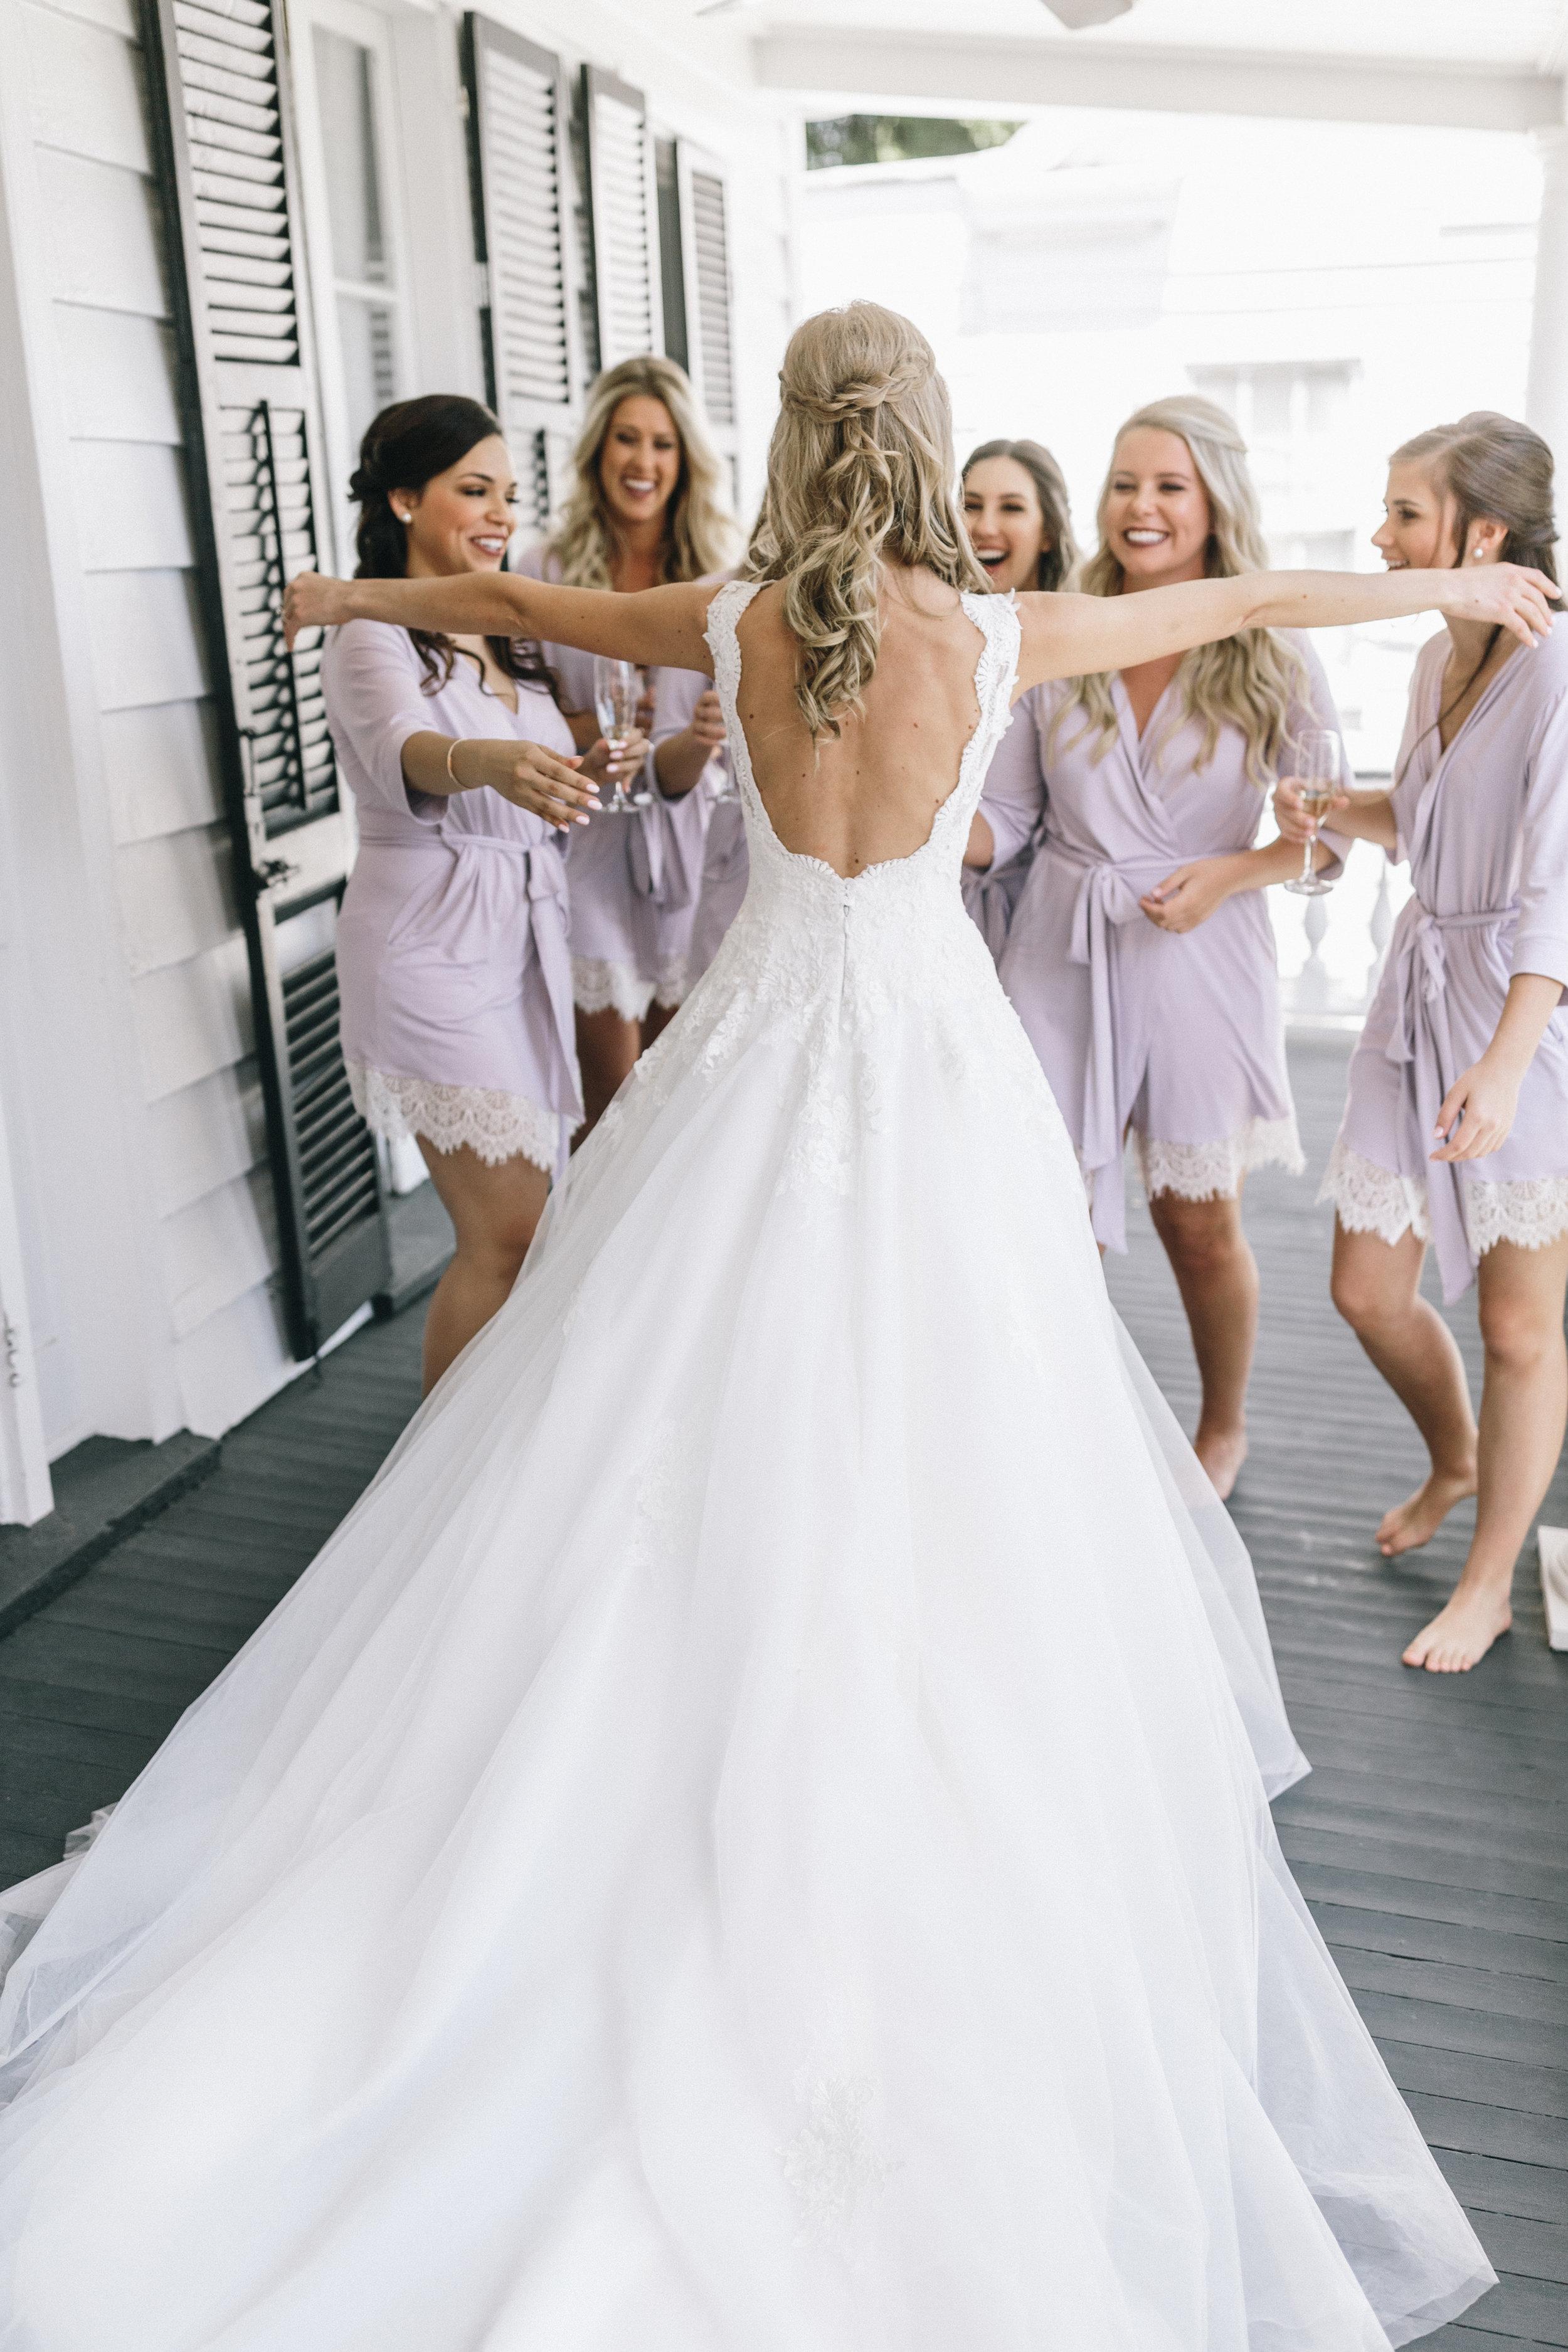 Jenna+Michael_wedding-98.jpg